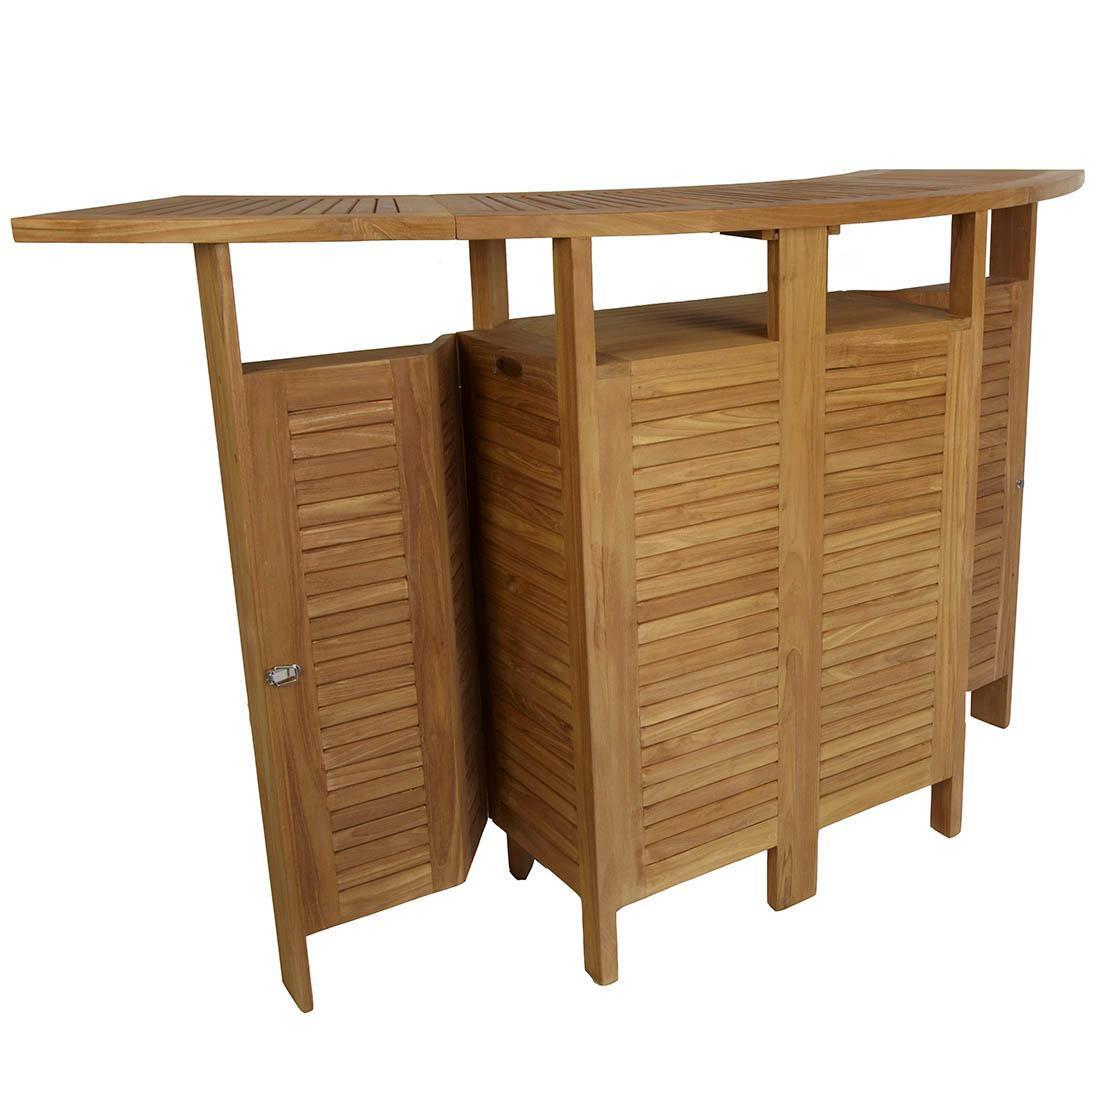 Barra de bar madera de teca oferta jard n y exteriores for Diseno de barras de bar en madera